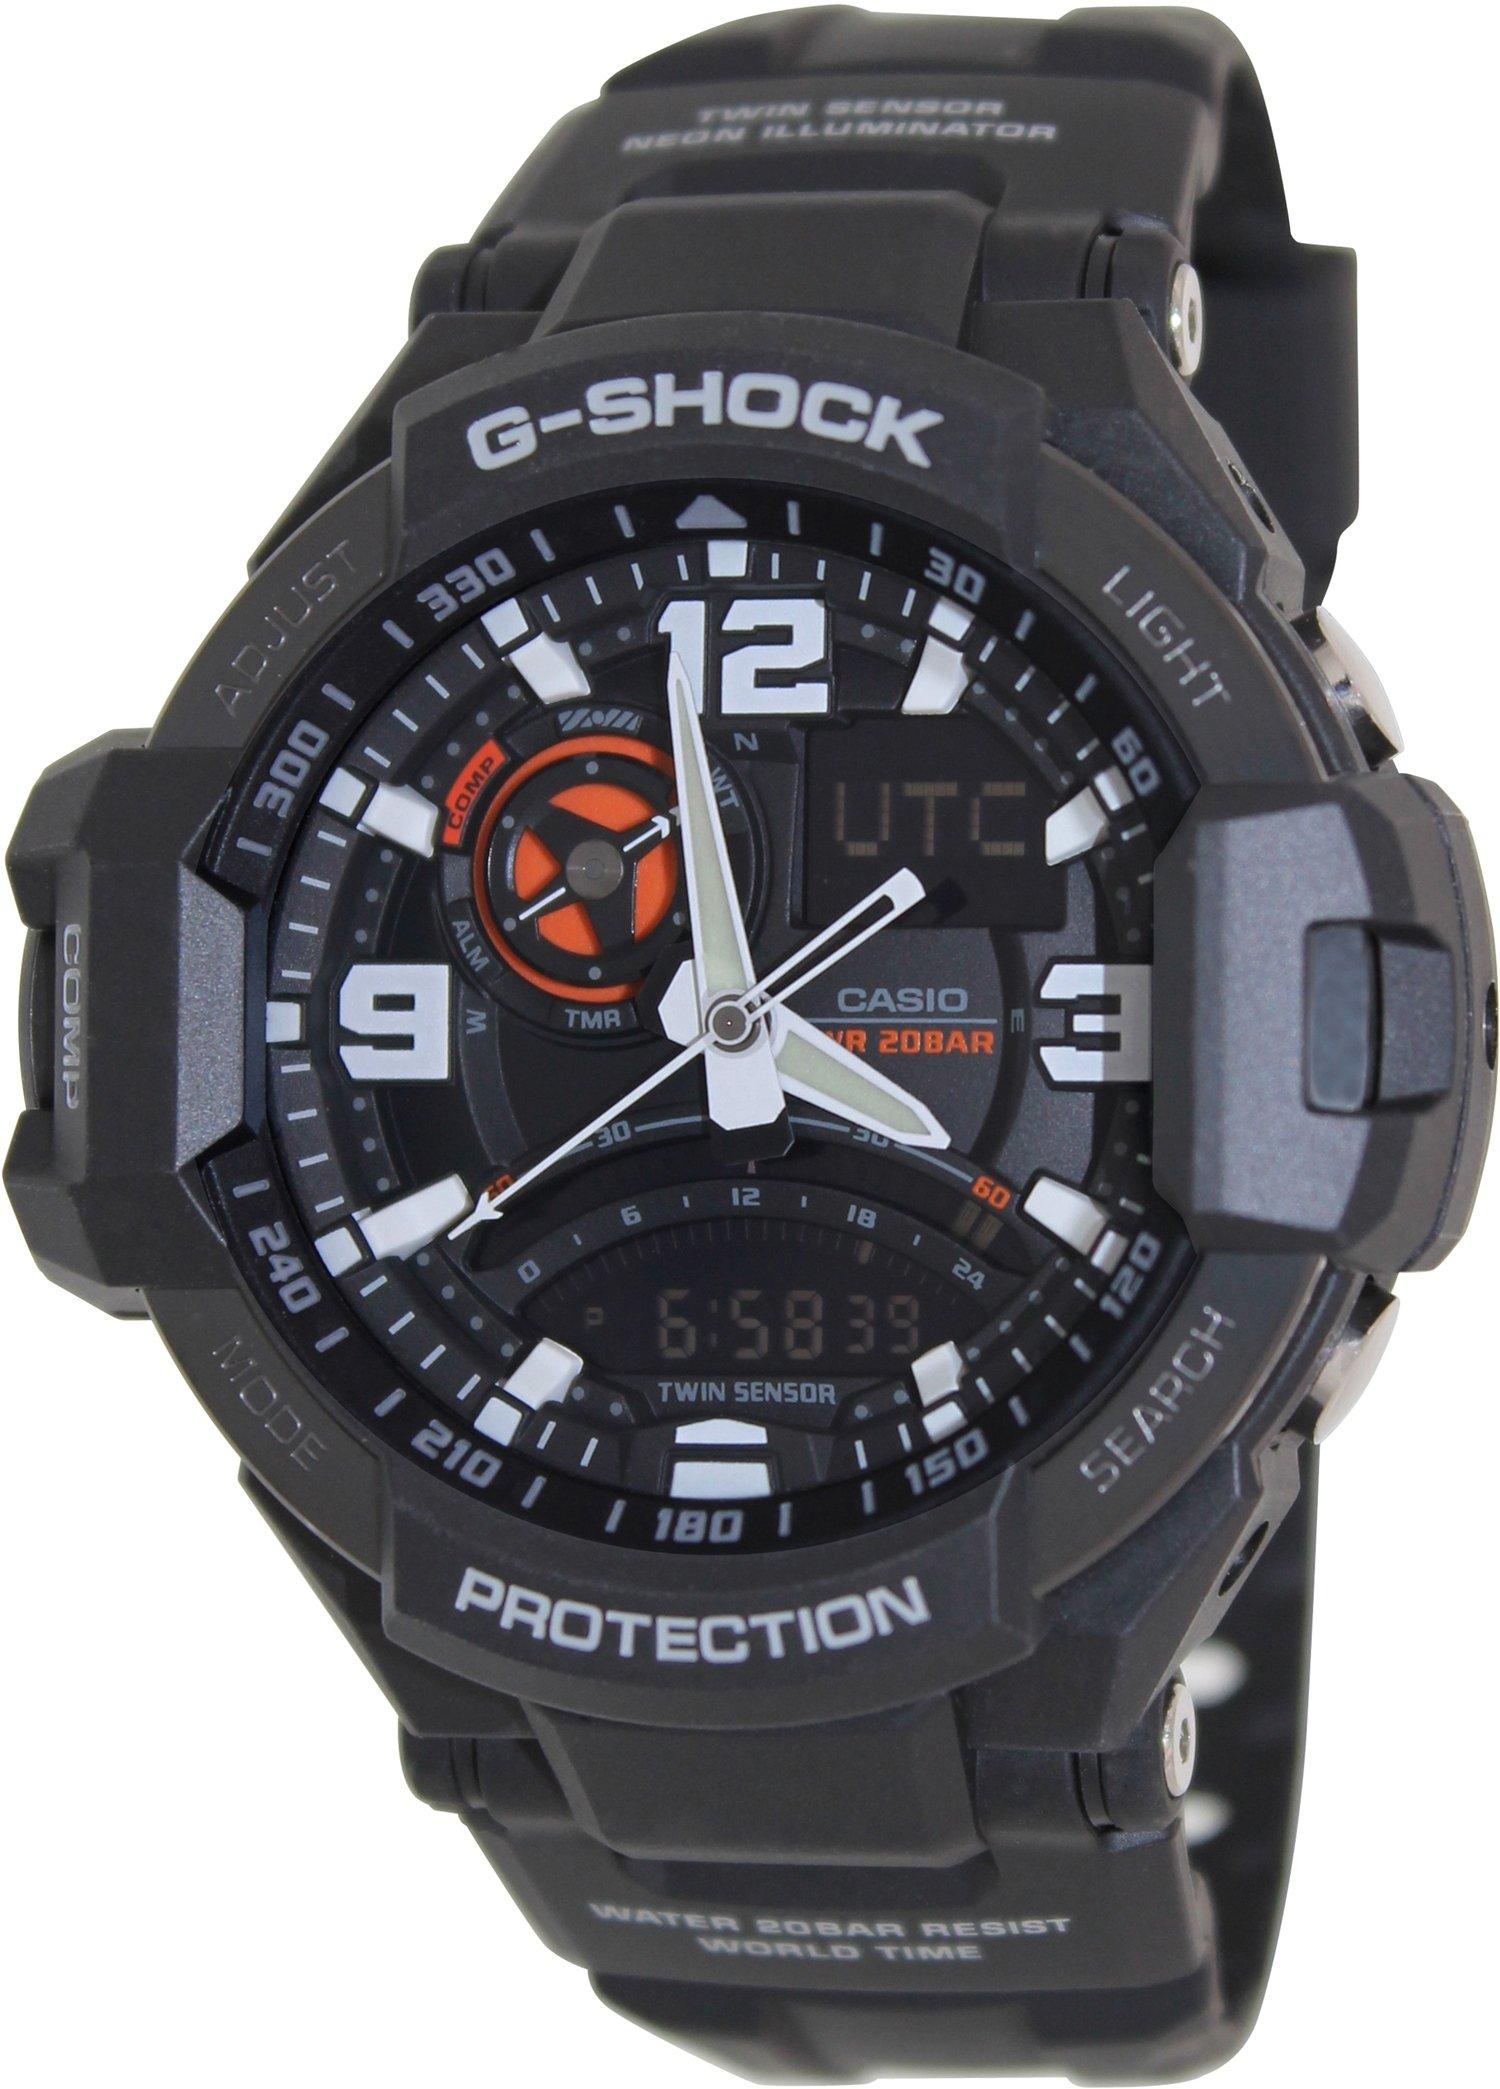 G-Shock Ga-1000-1A Aviation Series Men's Luxury Watch - Black / One Size 6